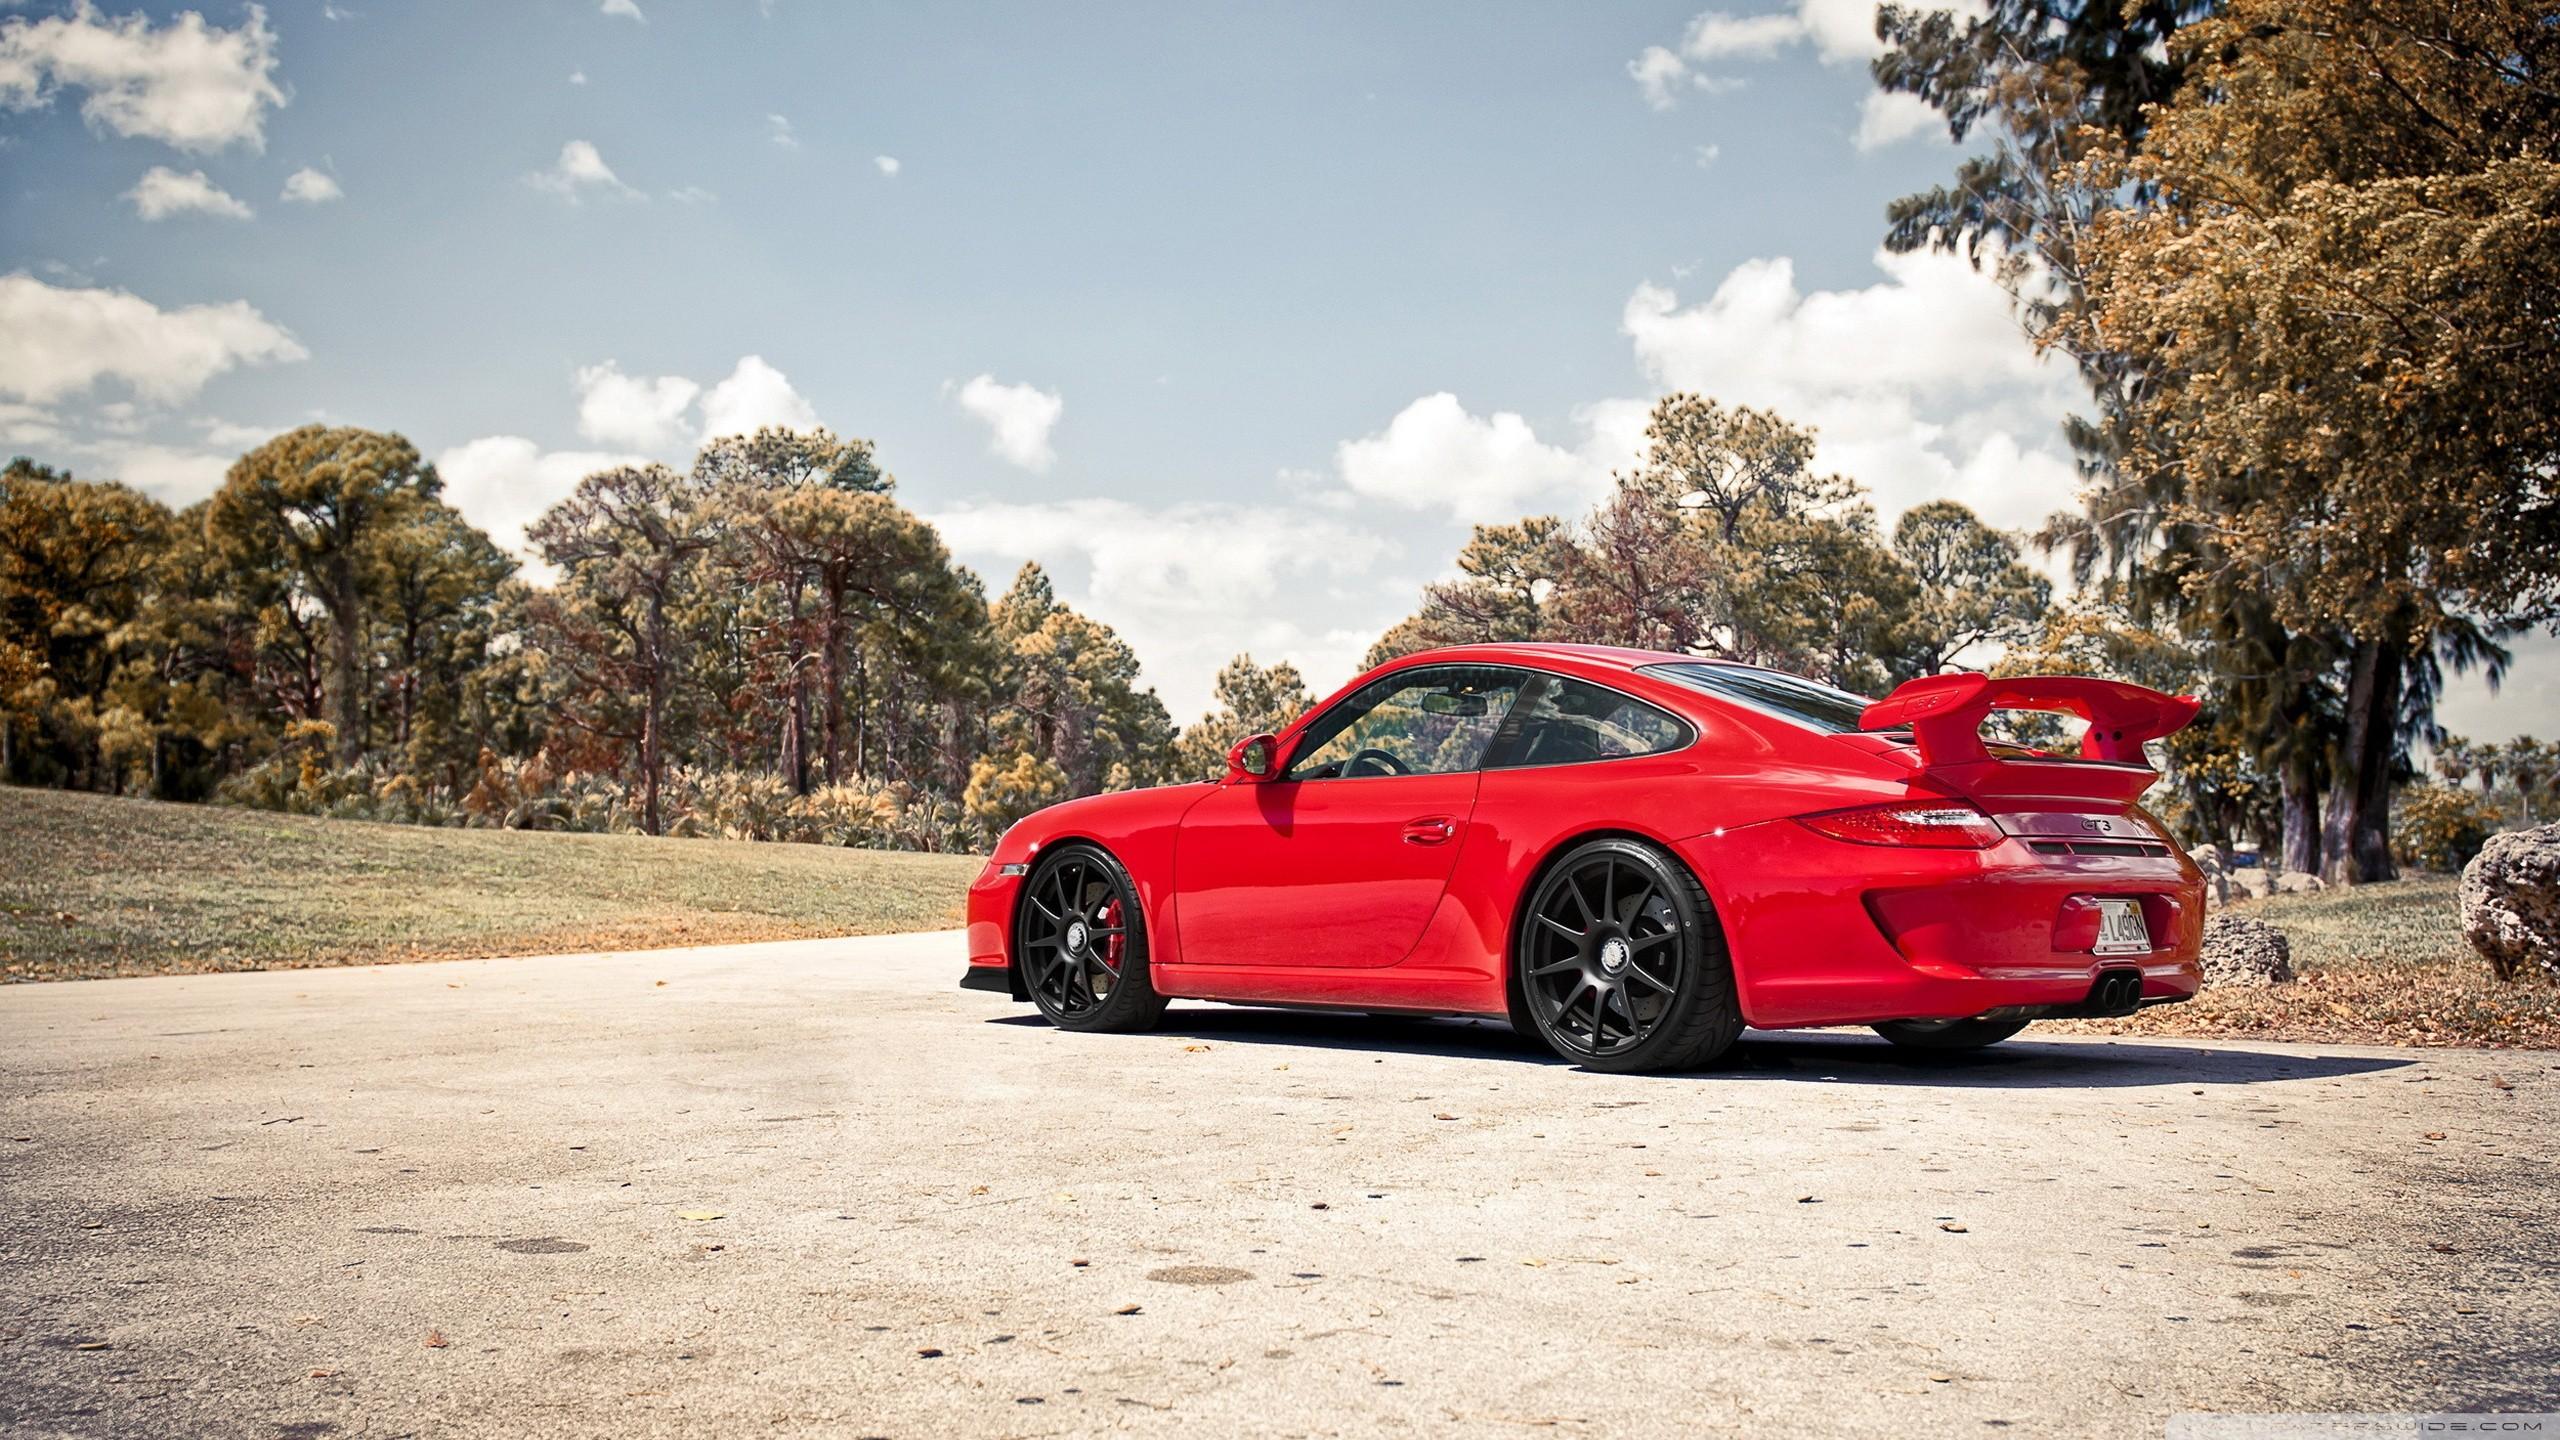 Porsche 911 Gt3 Hd Wallpaper Background Image 2560x1440